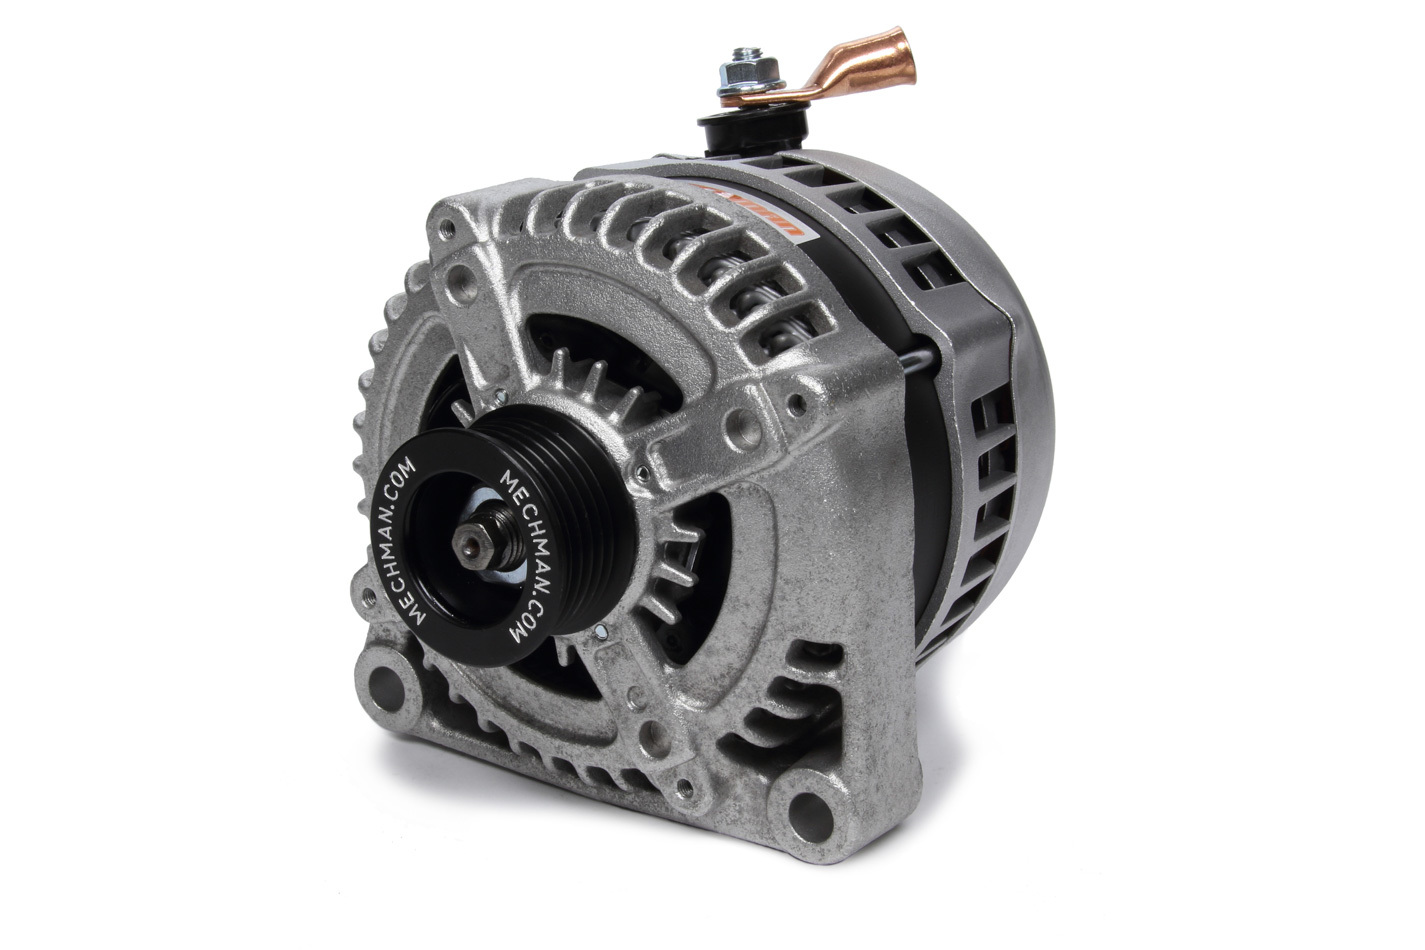 Mechman Alternators 9050320 Alternator, S-Series, 320 amp, 12V, 1-Wire, 6 Groove Serpentine, Natural, Universal, Each